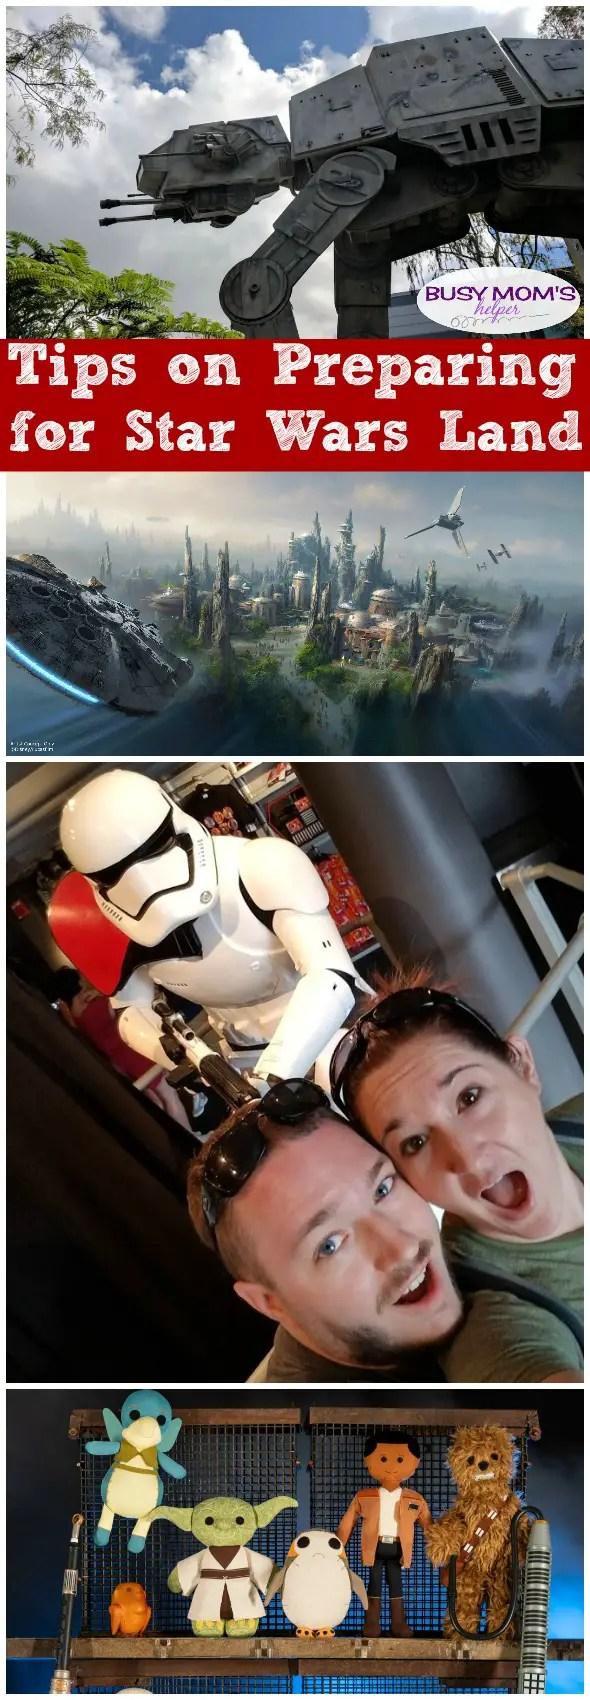 Tips for Preparing for Star Wars Land #starwars #waltdisneyworld #disneyland #starwarsland #disneytrip #disneyparks #hollywoodstudios #familytravel